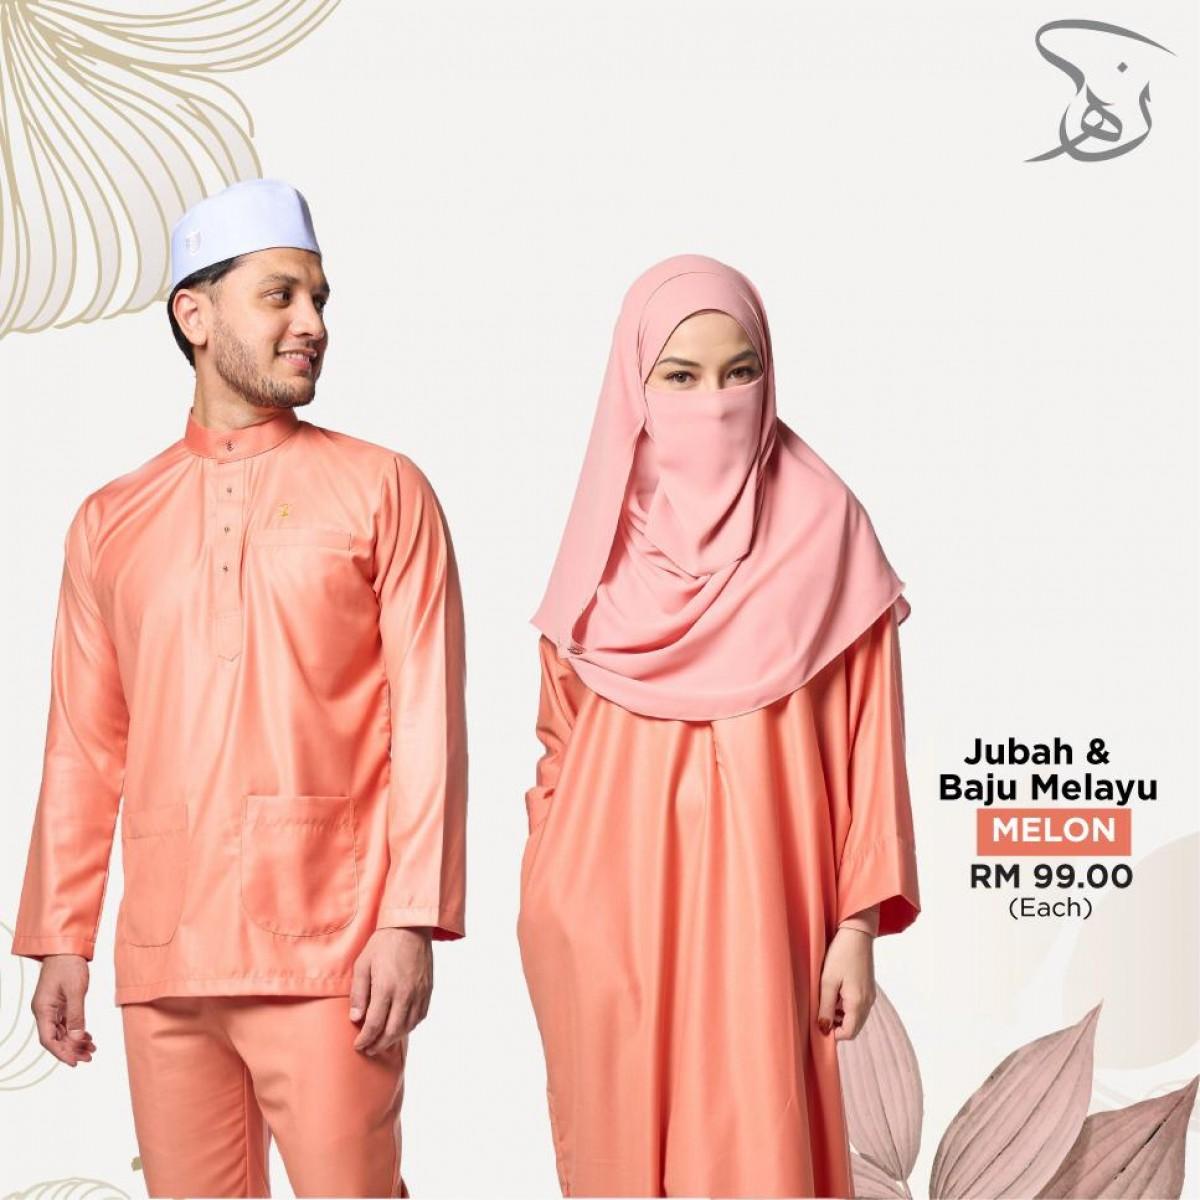 Set Couple Jubah & Baju Melayu - Melon - MARKAZ TIJAARI